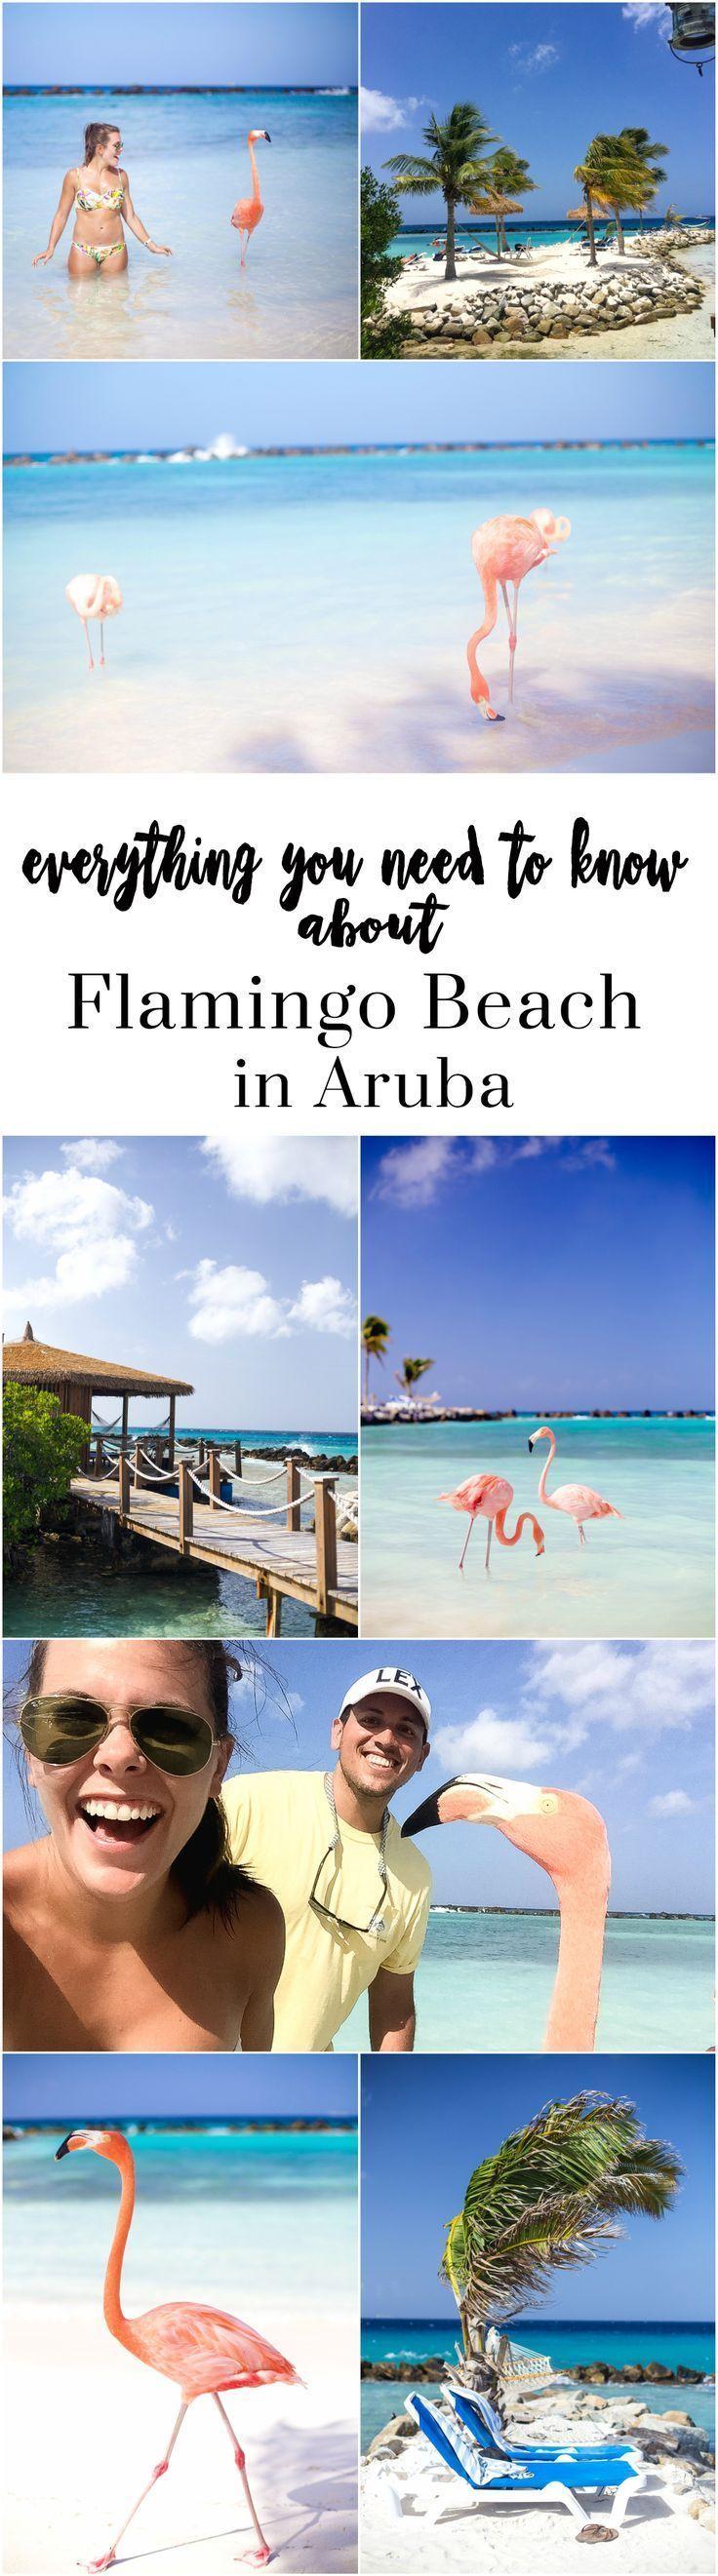 Aruba Travel Guide 76 best Aruba images